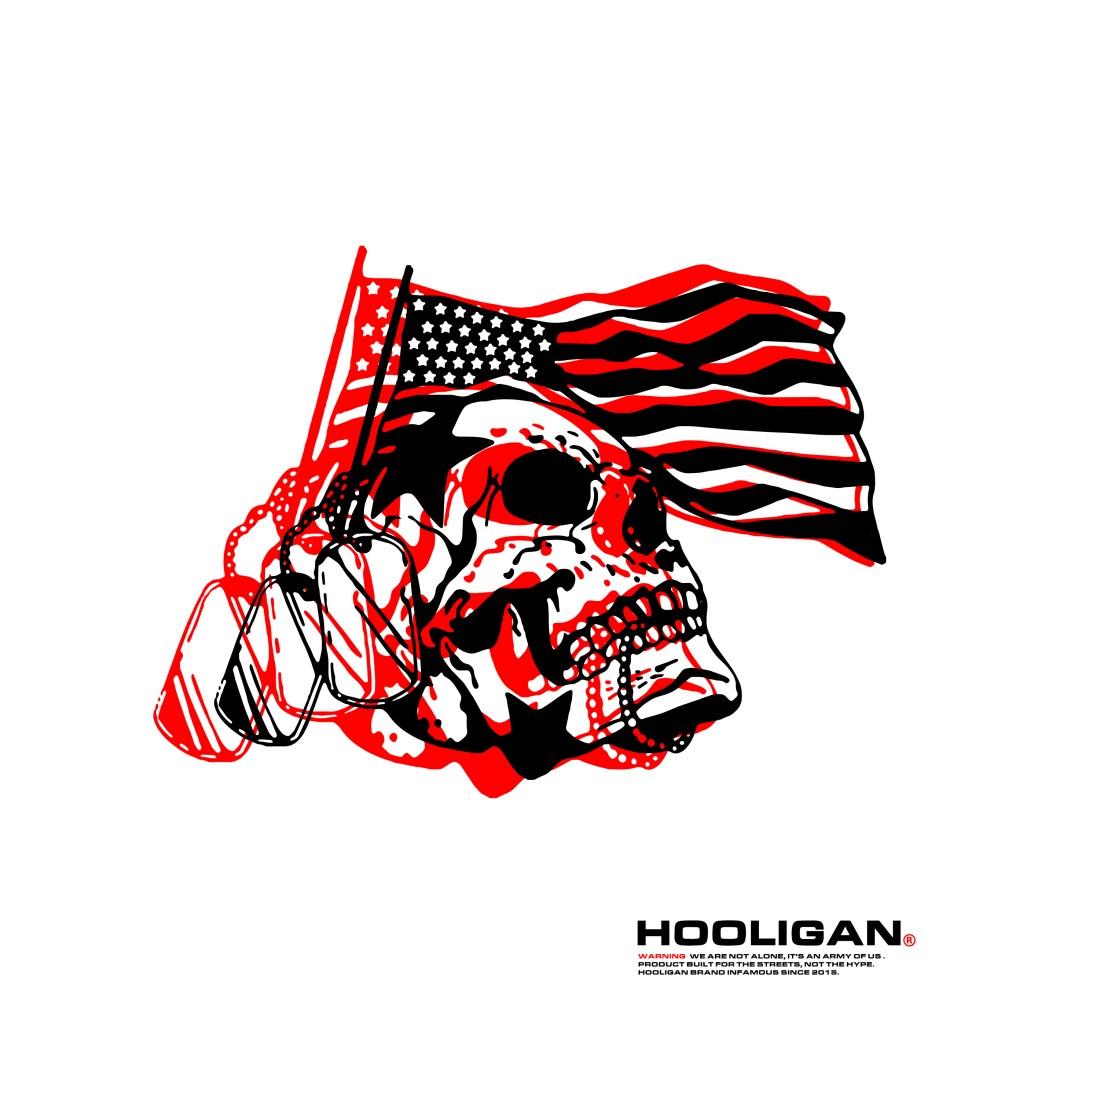 hooligan brand the underground